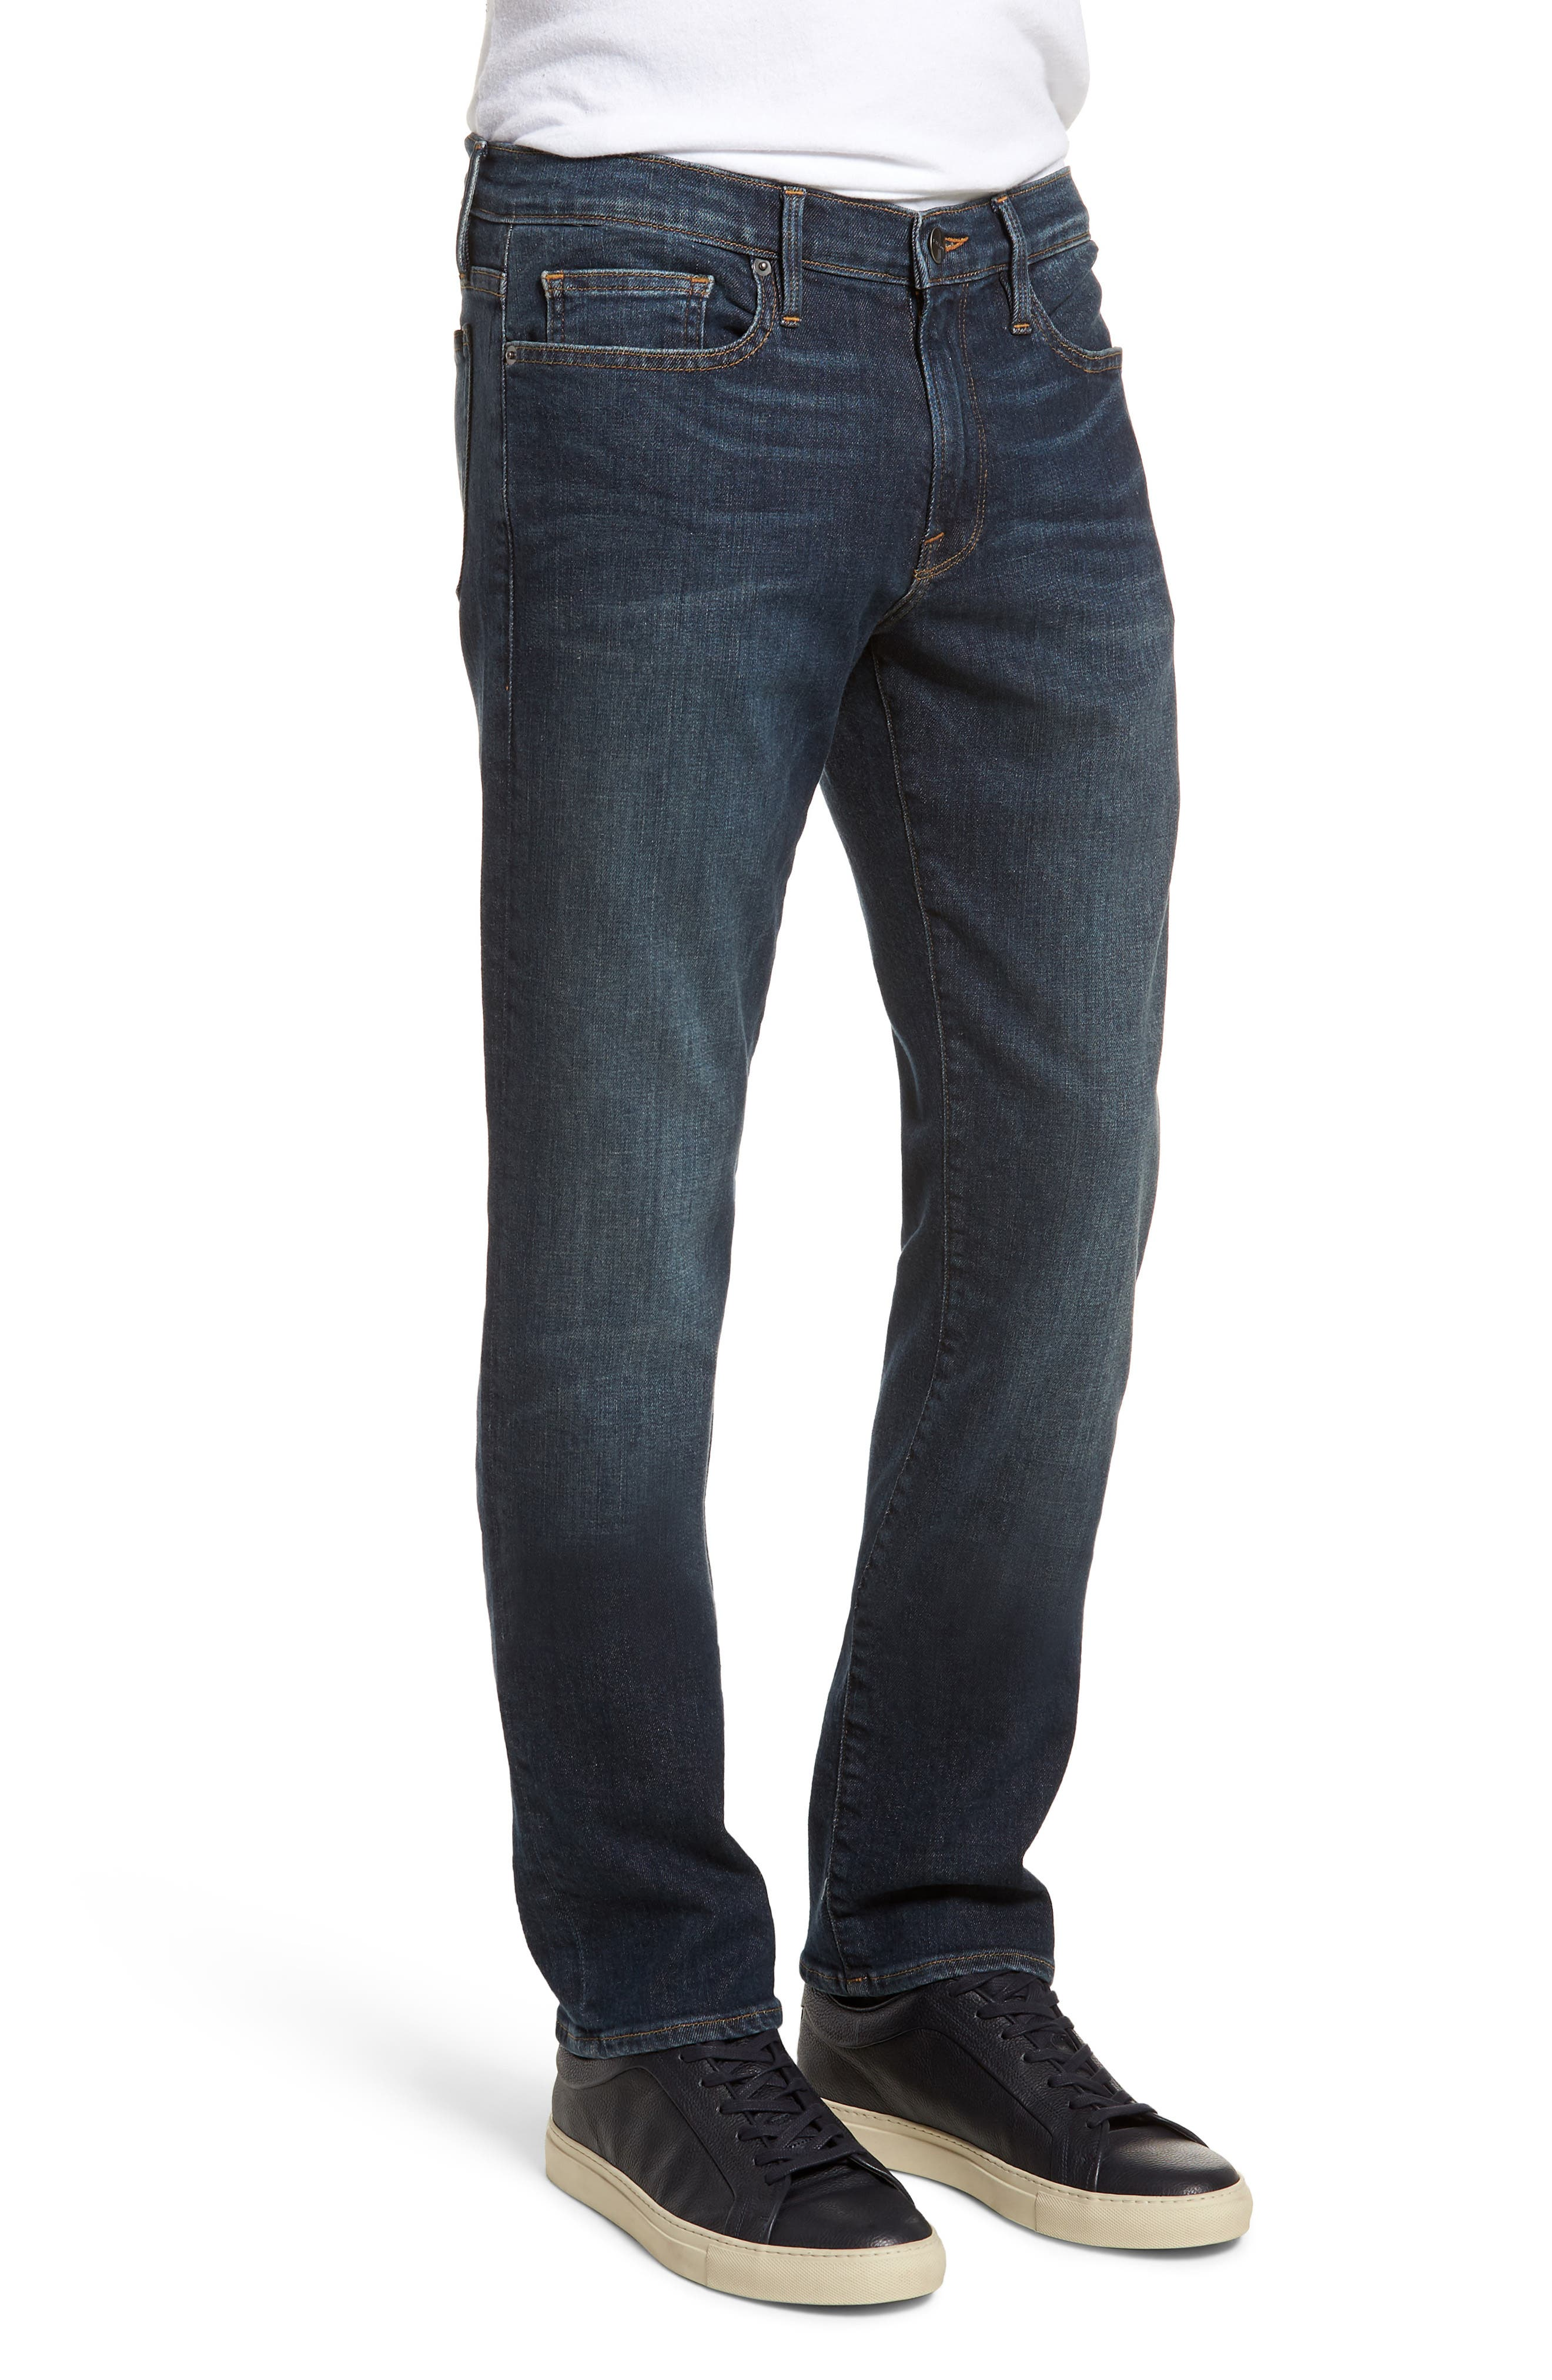 L'Homme Slim Fit Jeans,                             Alternate thumbnail 3, color,                             Joshua Tree